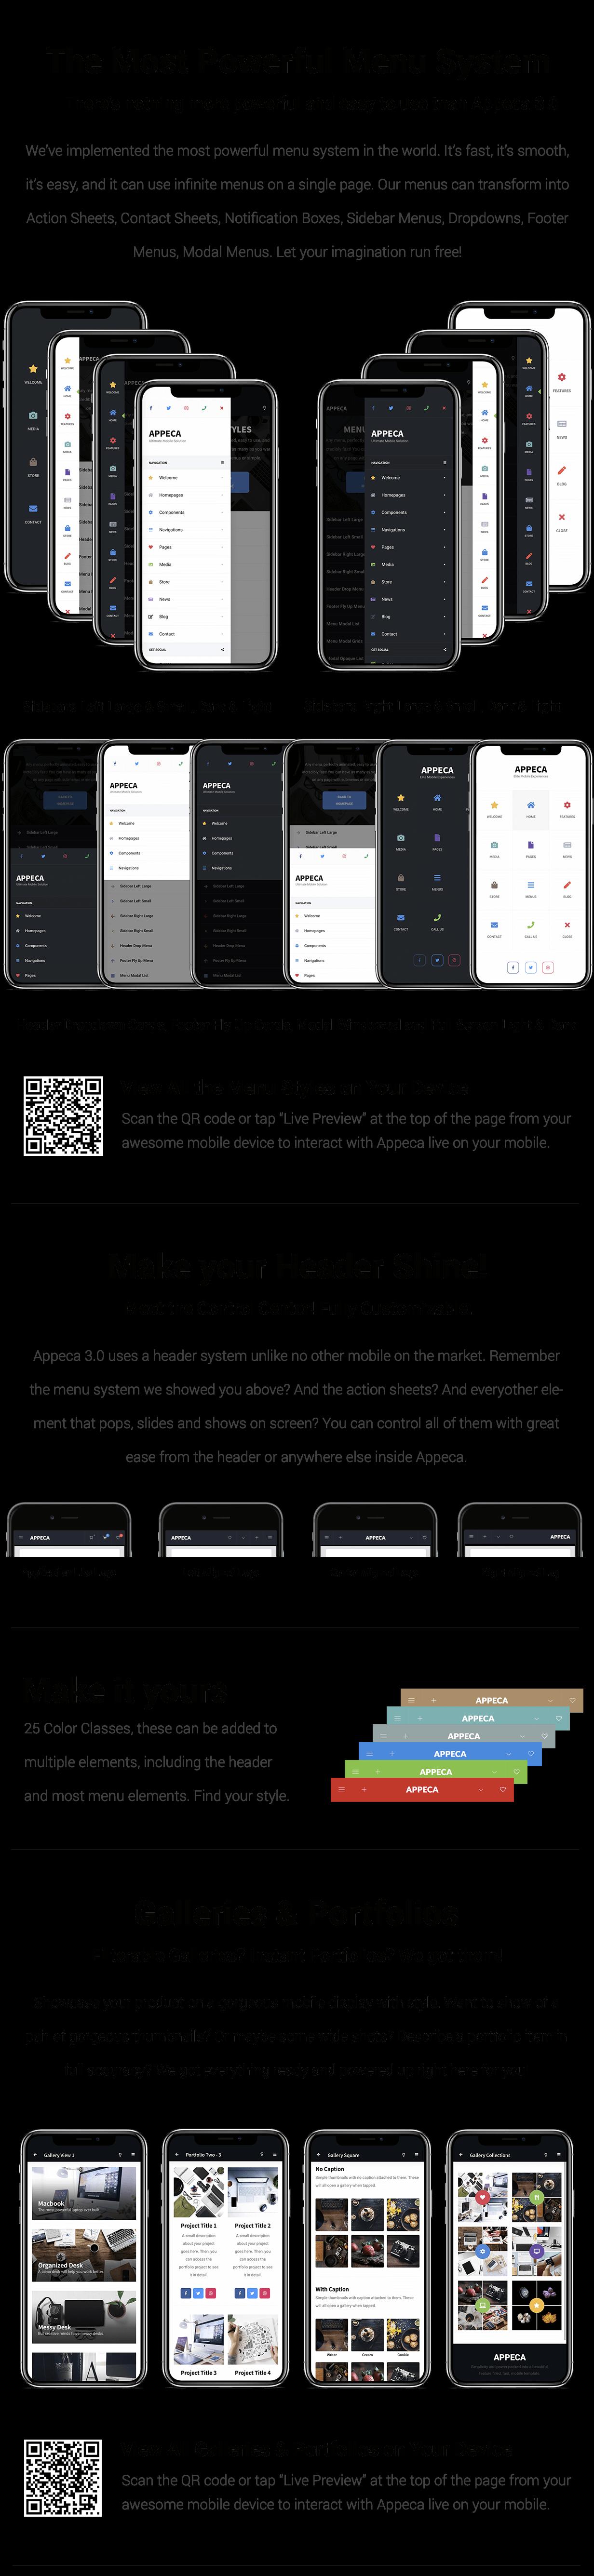 appeca 2b - Appeca Ultimate Mobile Template